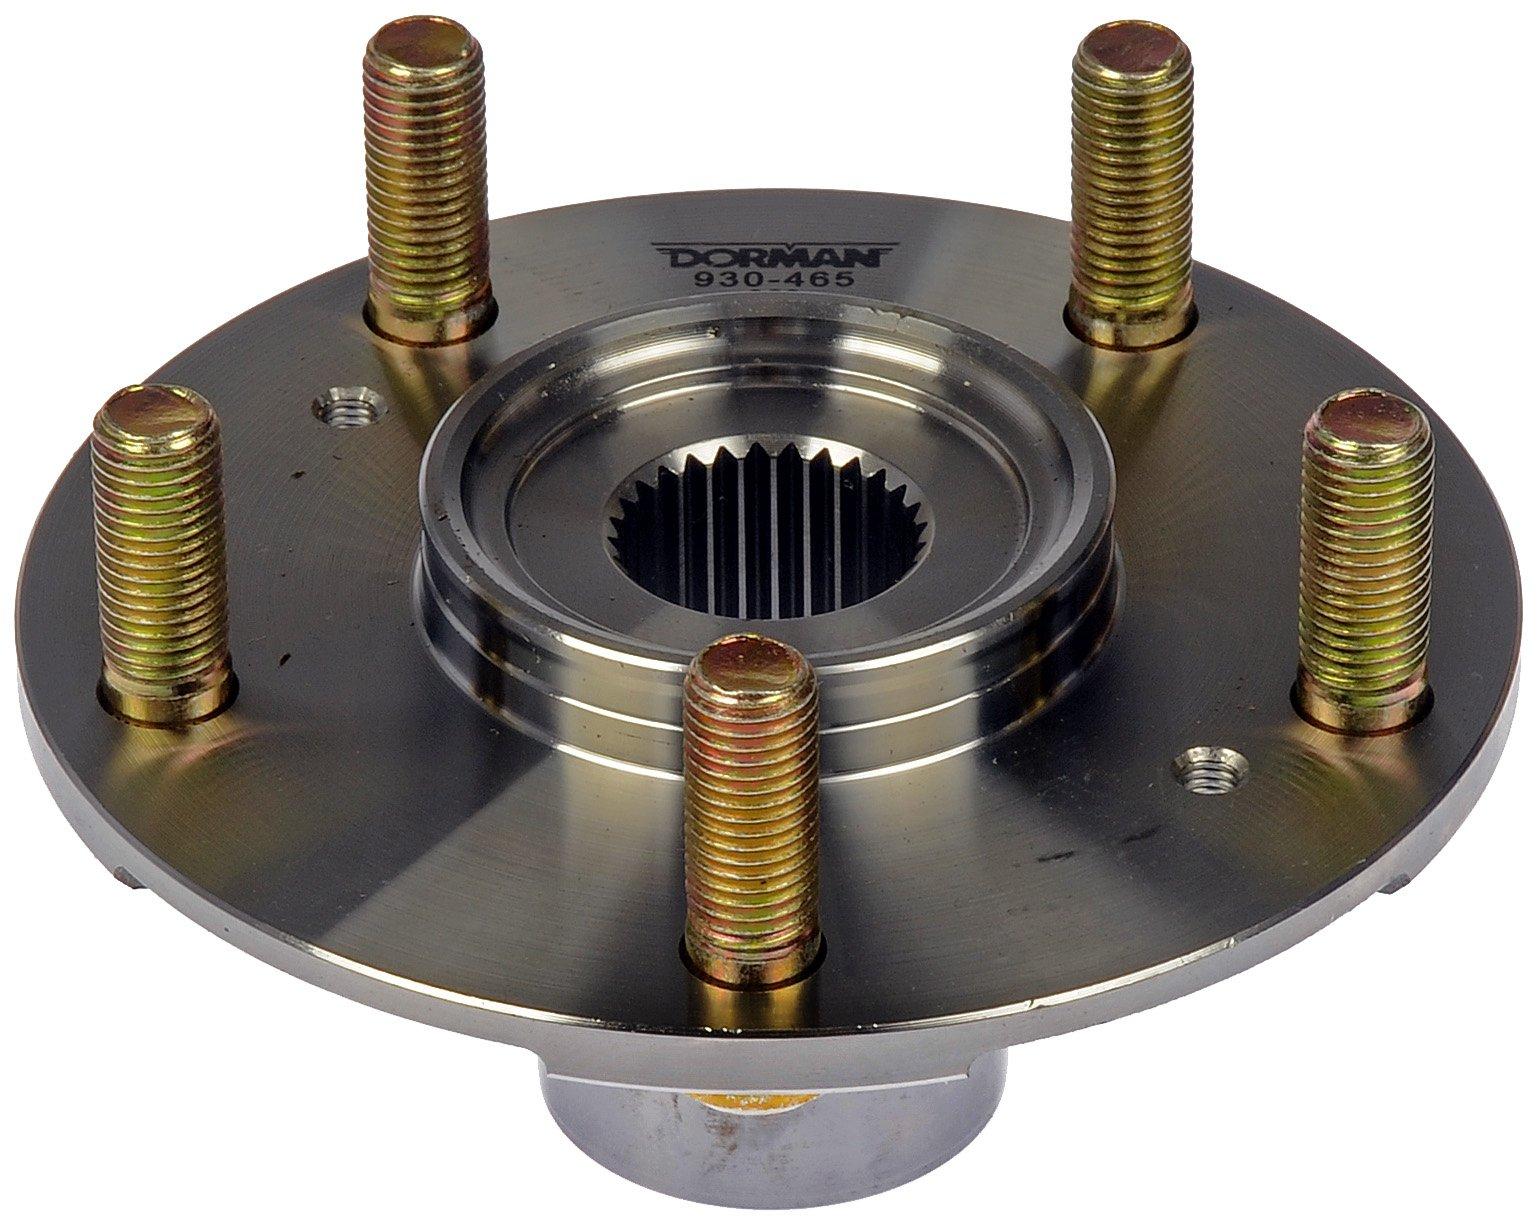 Prime Choice Auto Parts HB612442PR Pair of Rear Wheel Hub Bearing Assemblies